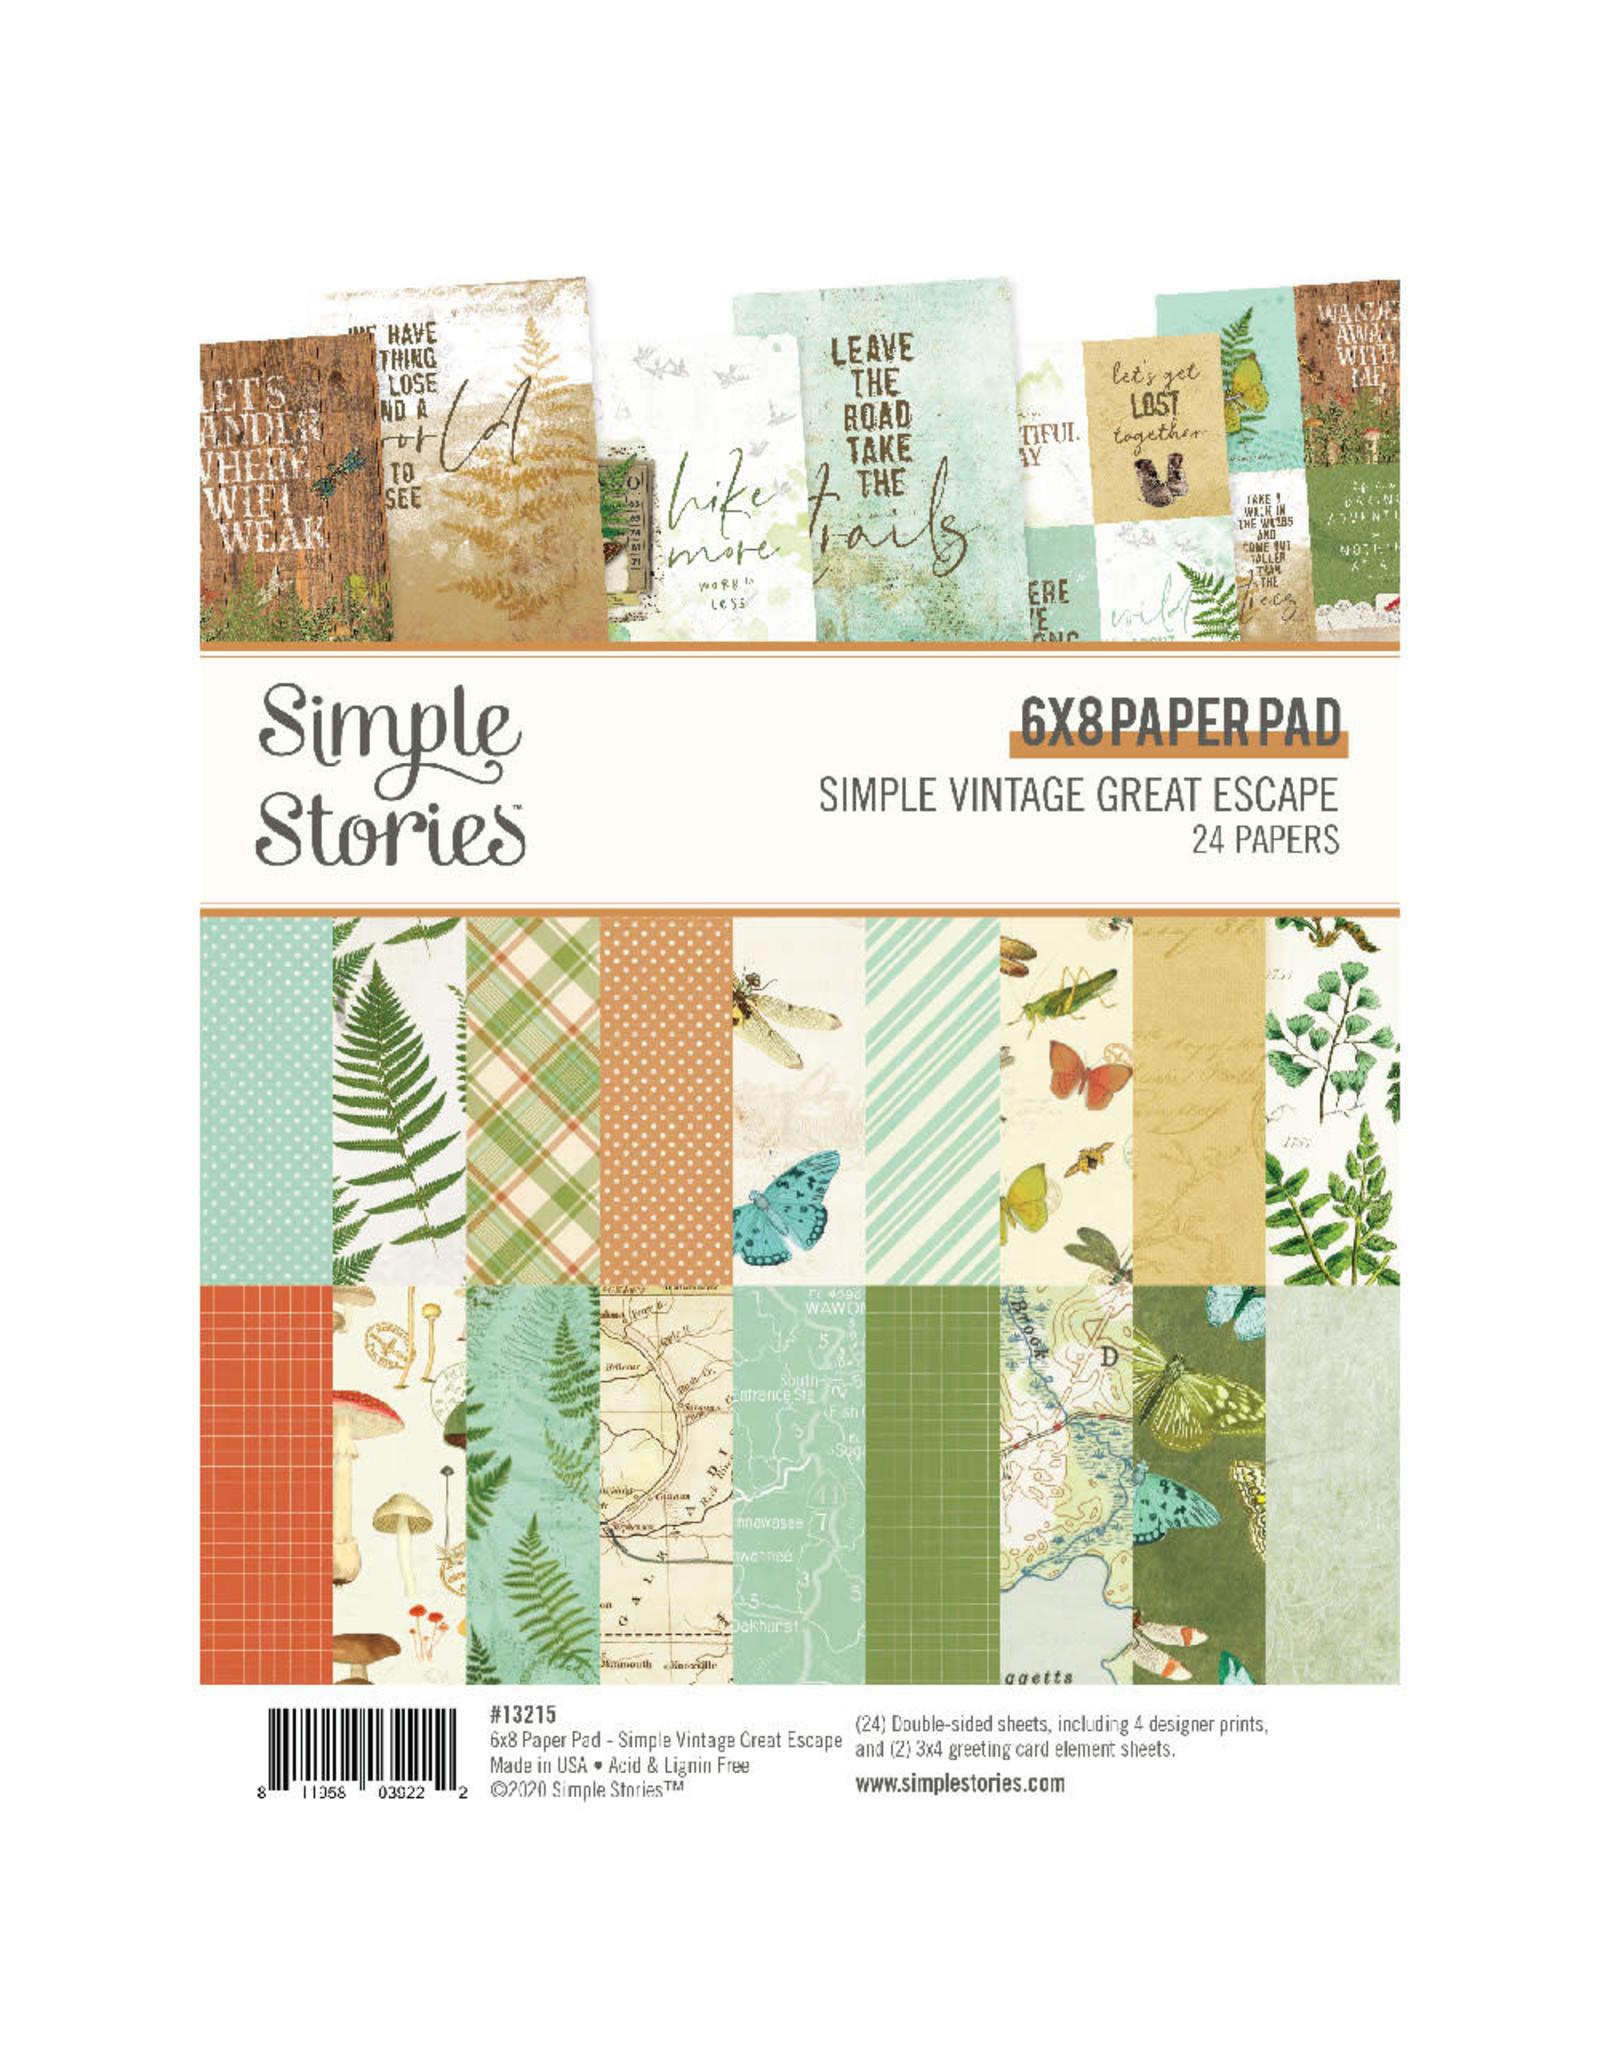 Simple Stories Simply Vintage Great Escape 6x8 Paper Pad